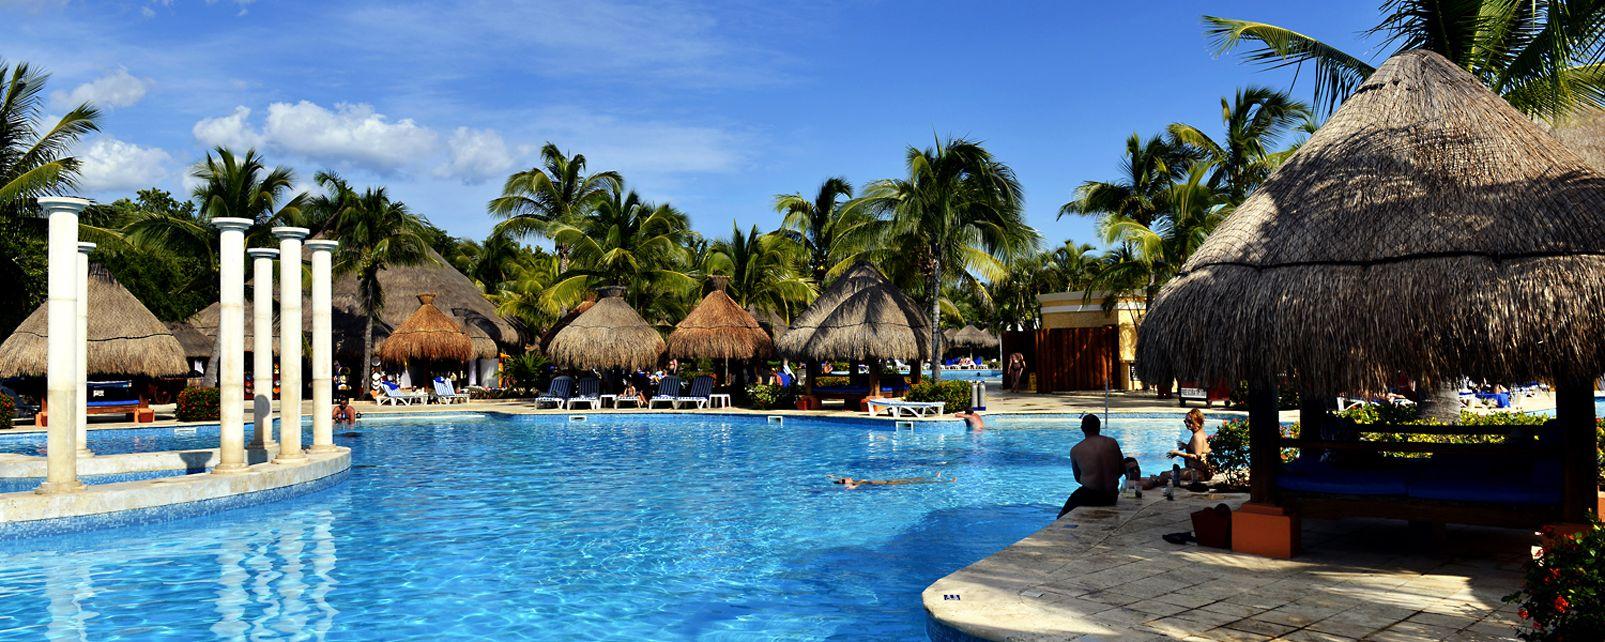 Hotel Viva Azteca